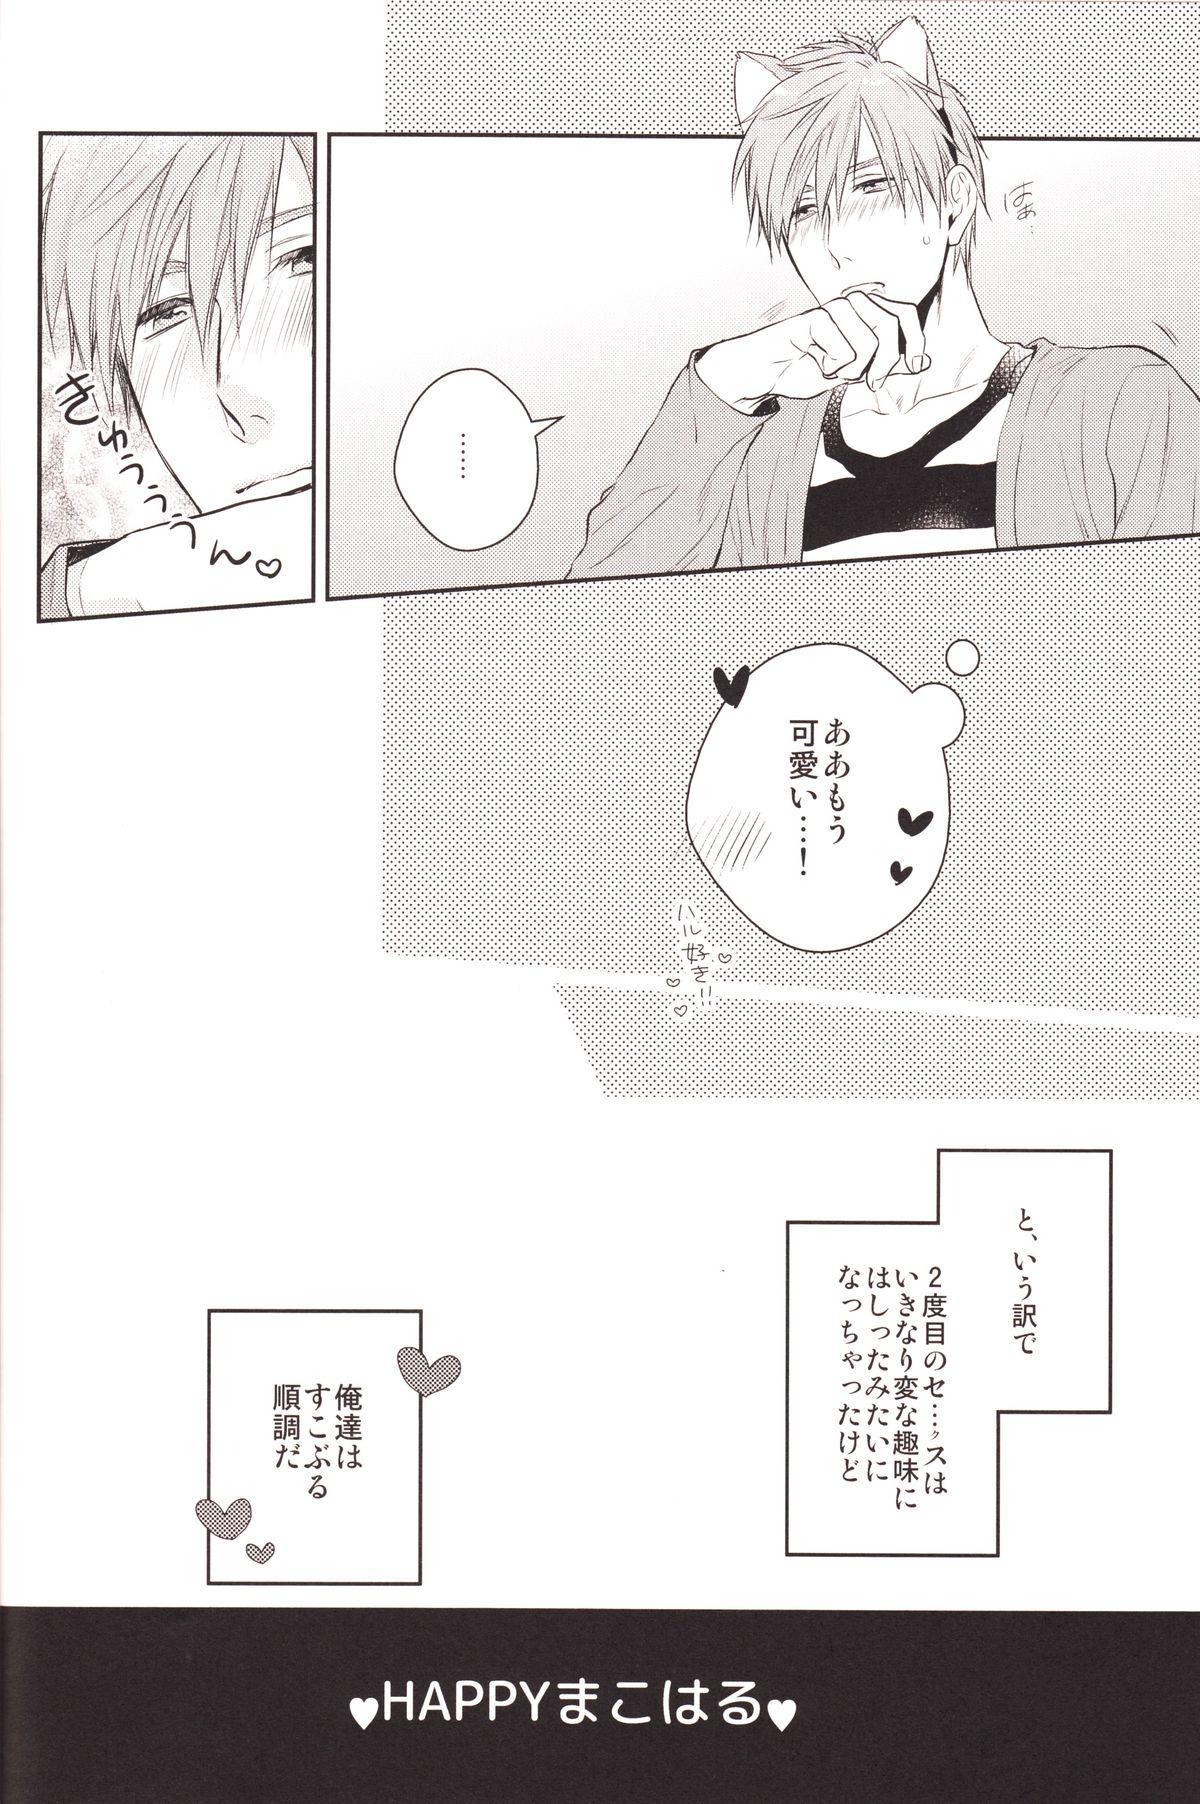 Haru-chan no Wanko 18